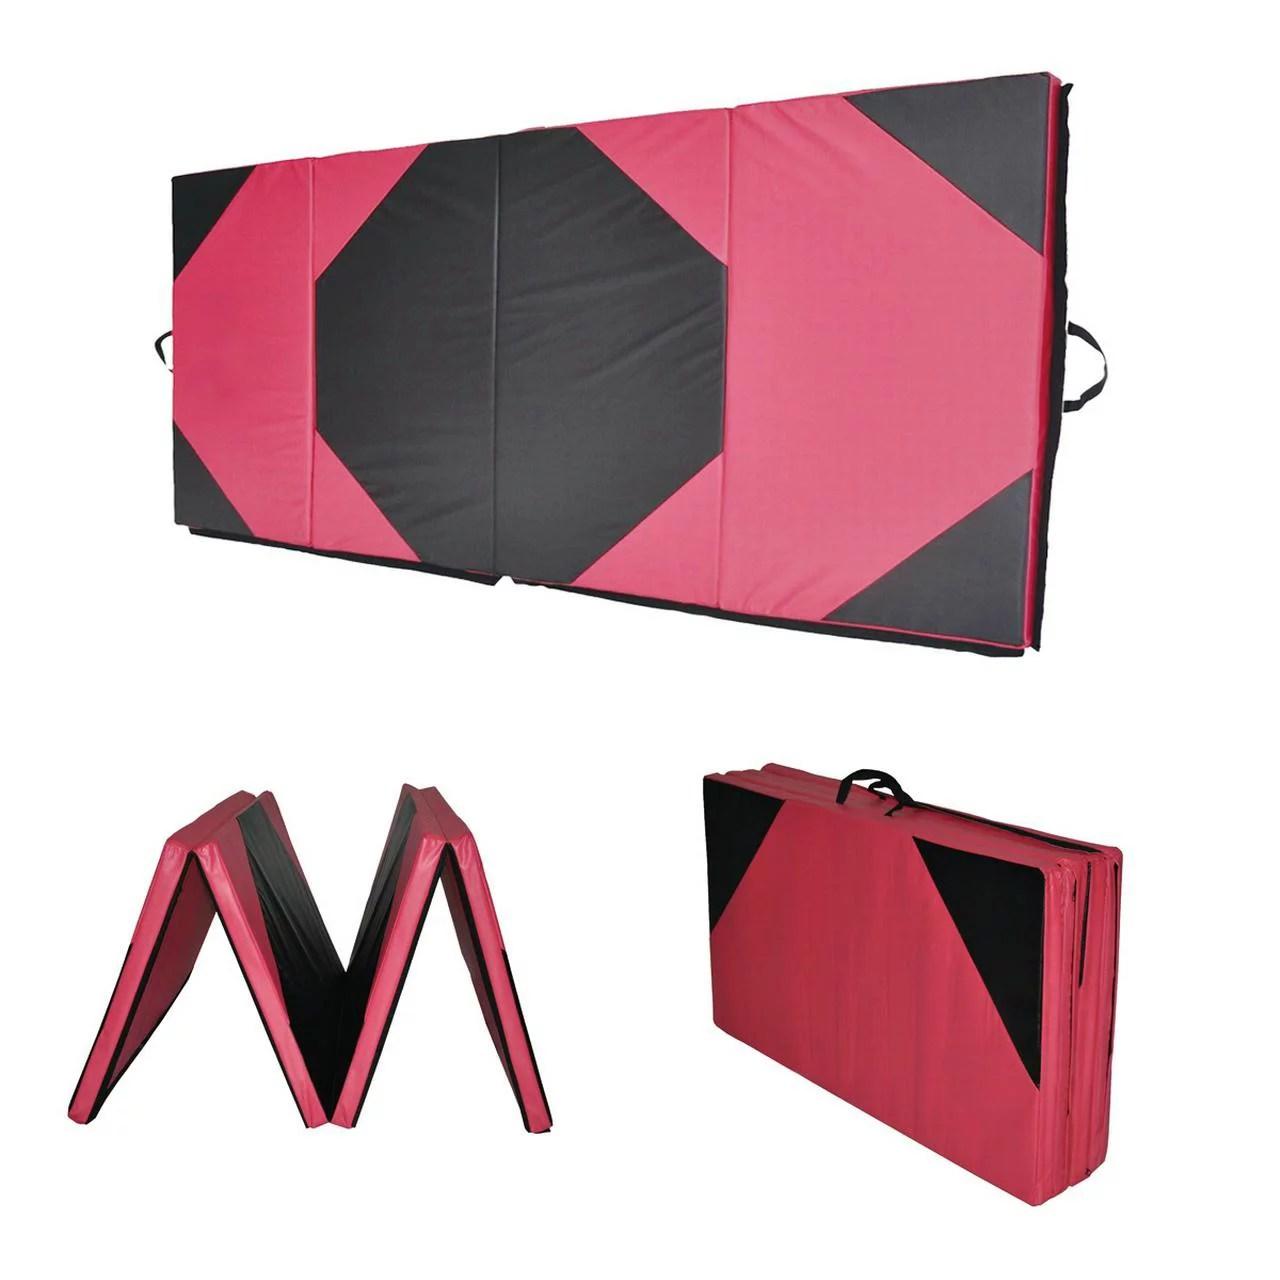 4 X10 X2 Exercise Tri Fold Gym Mat For Gymnastics